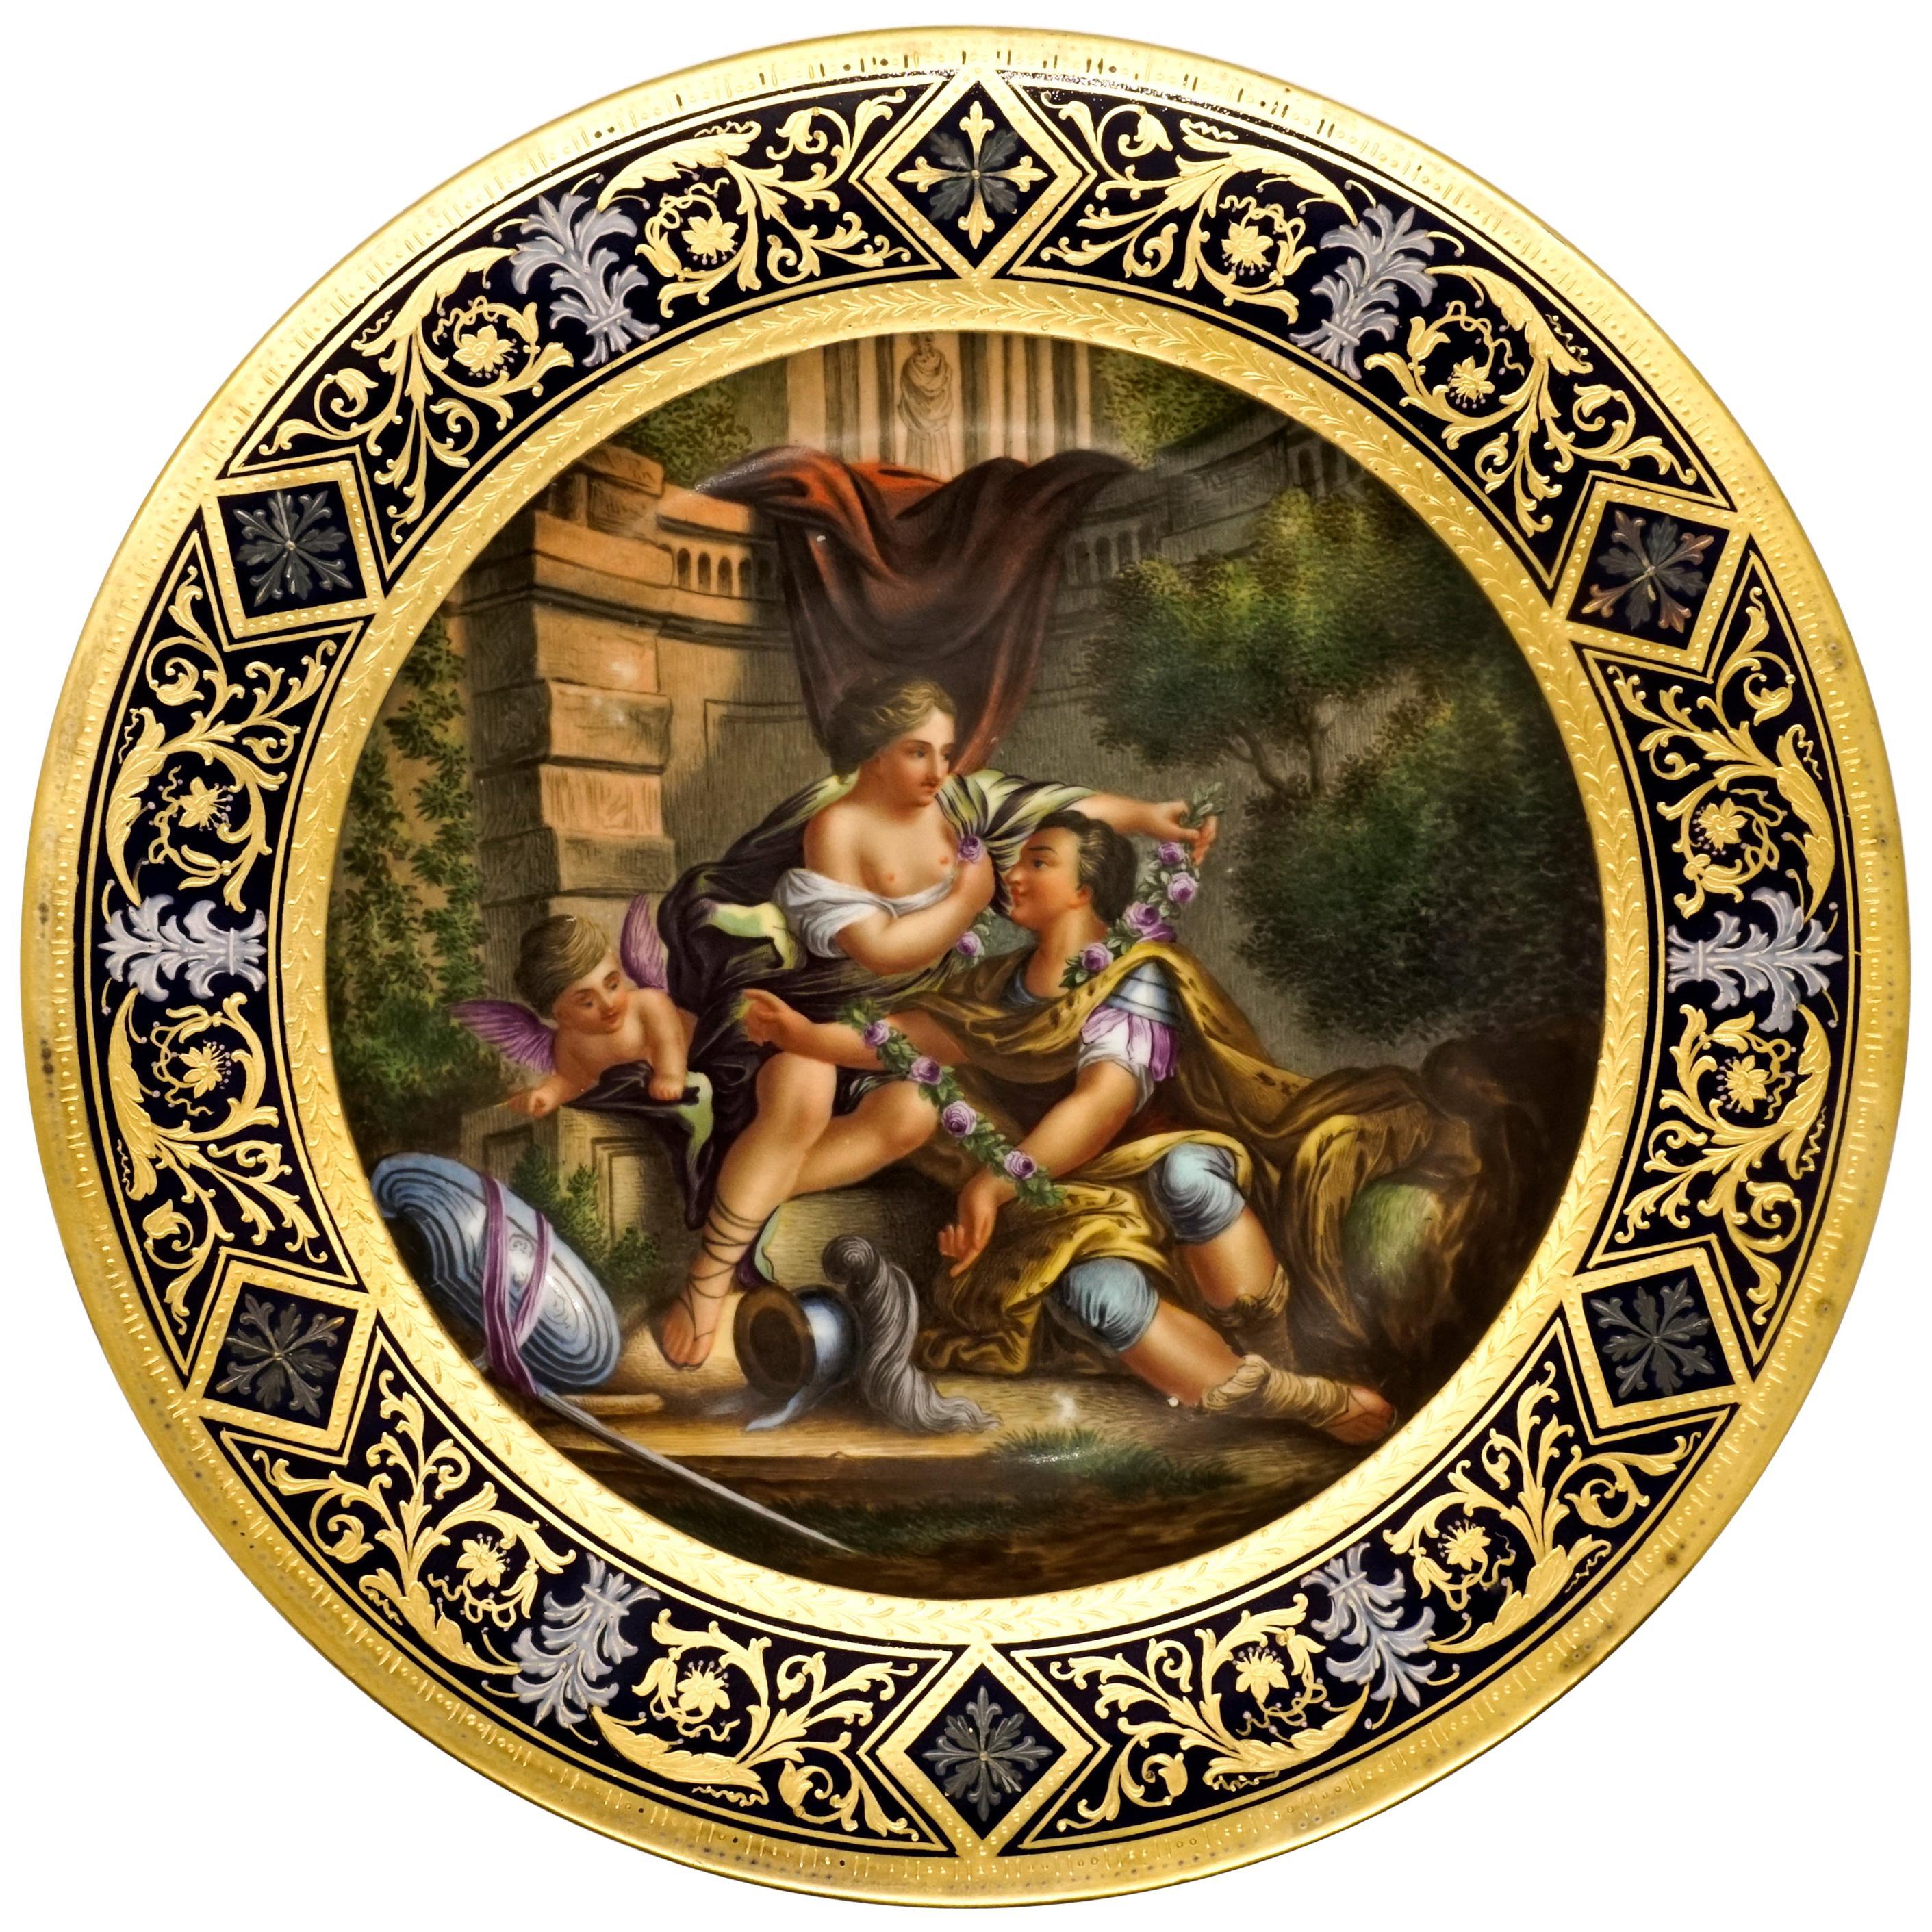 Royal Vienna Splendour Plate 'Roman Courting Scene With Cupid', circa 1890